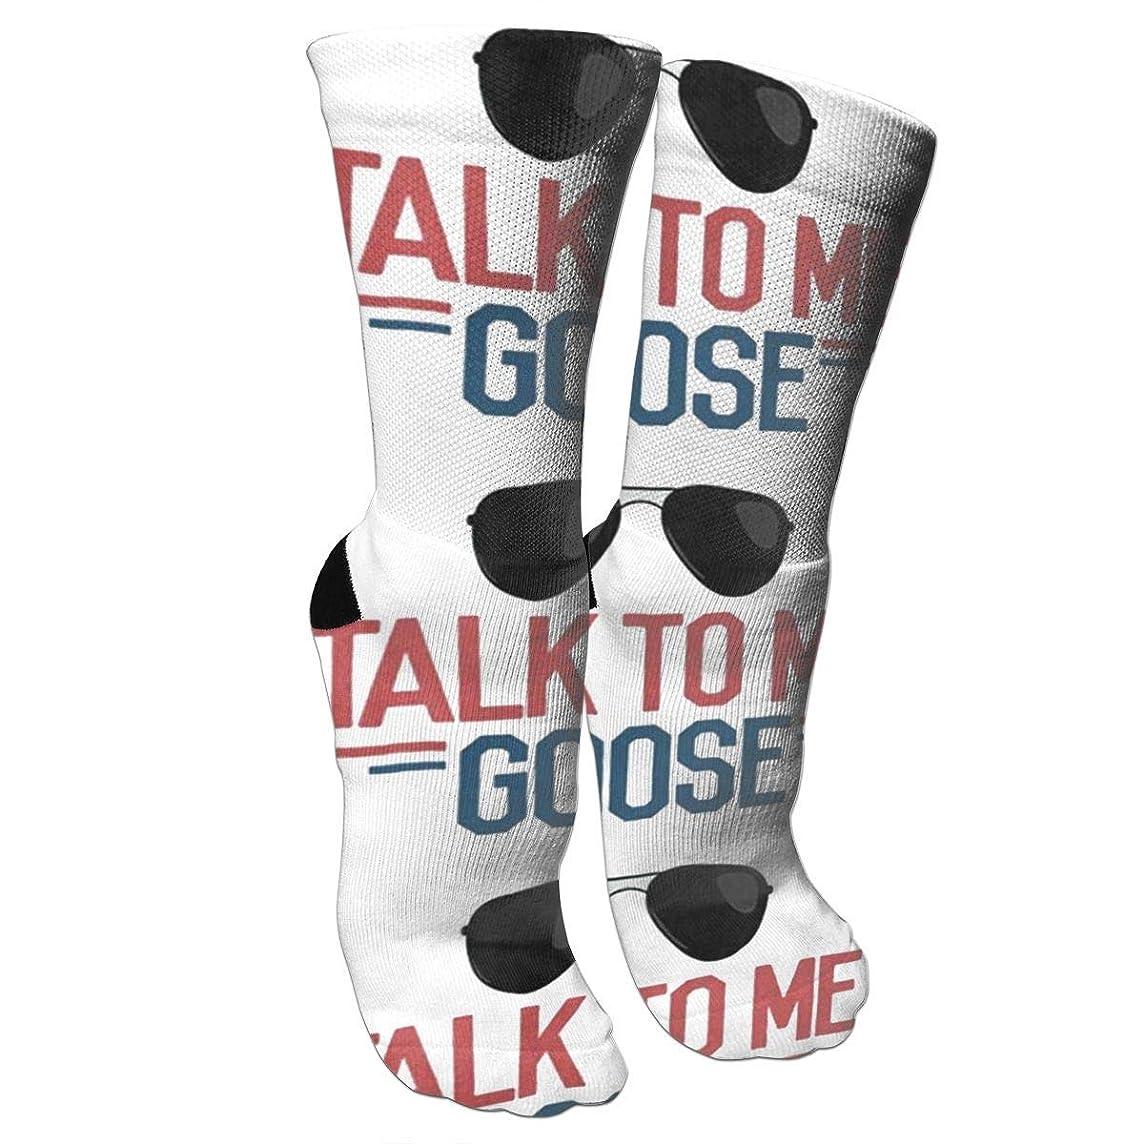 HUSIAJPK New Talk Goose New Parents Funny Saying Baby Onesie Bodysuit Athletic Tube Stockings Women's Men's Classics Knee High Socks Sport Long Sock One Size